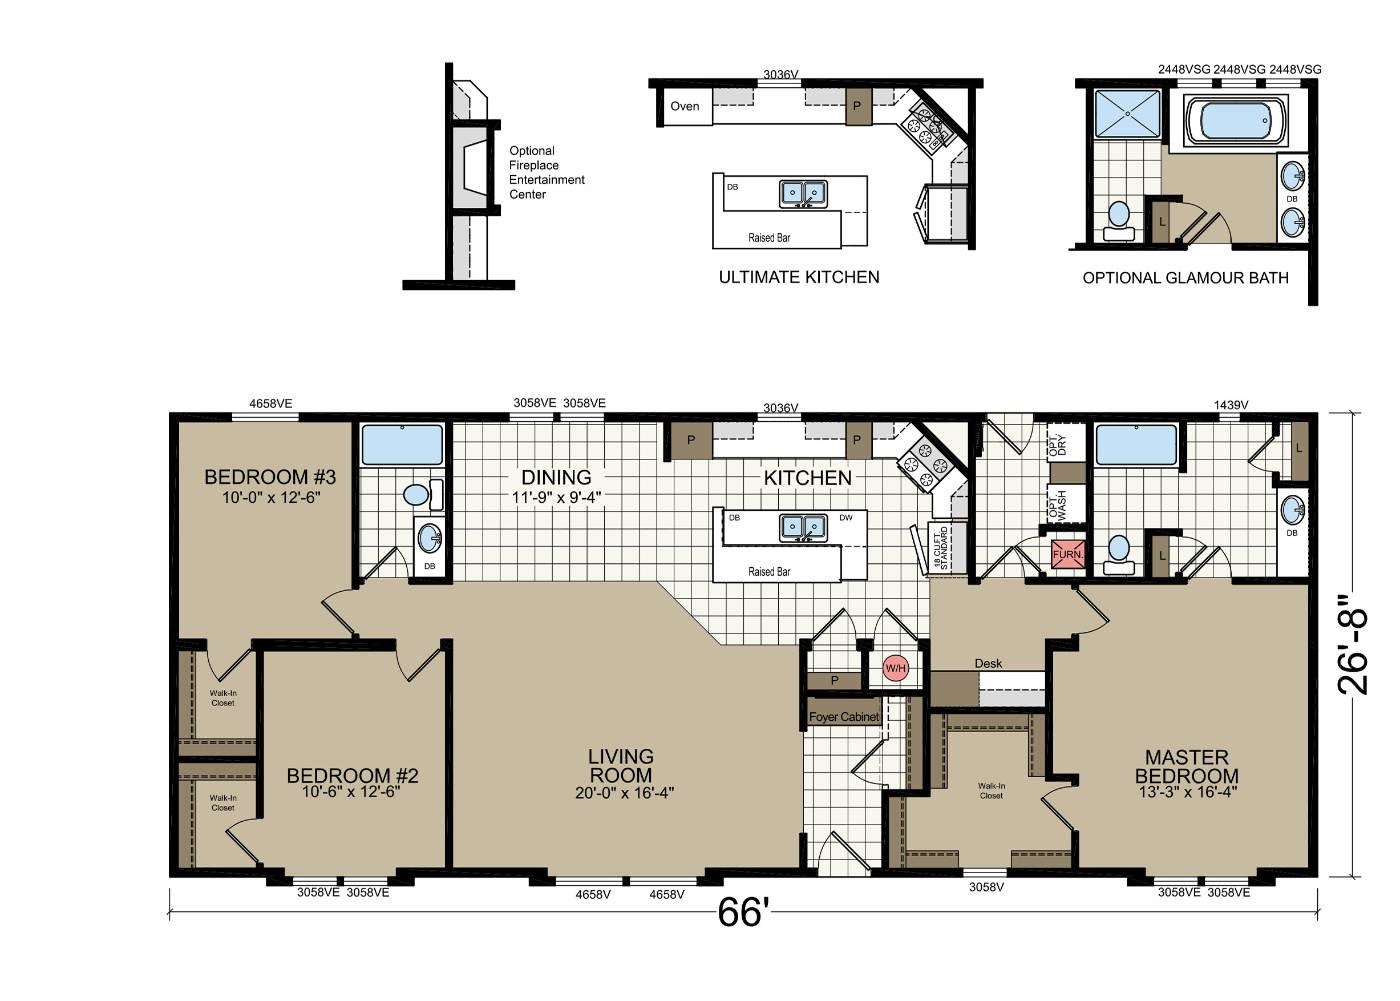 model floorplan layout